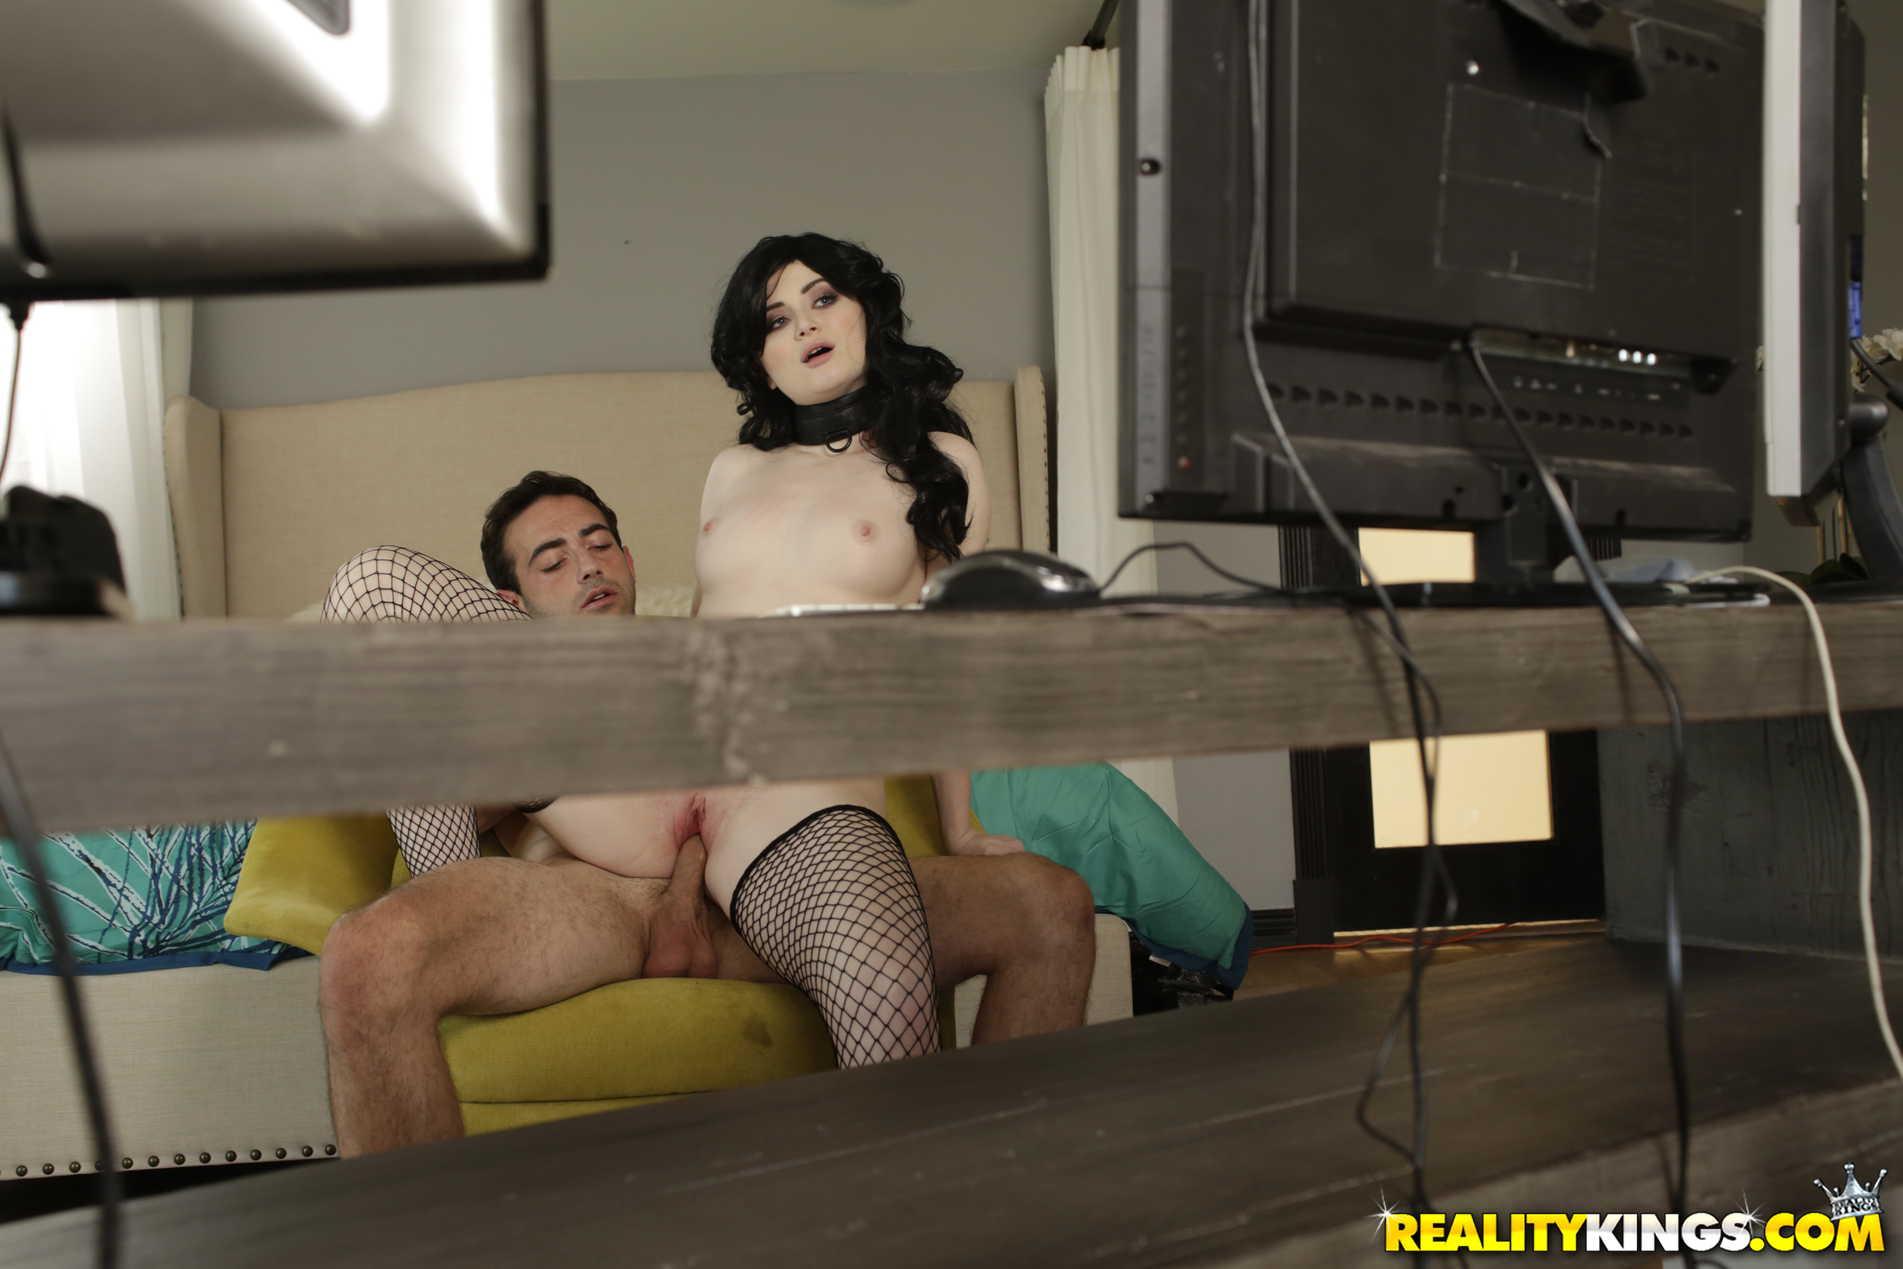 Reality Kings 'Fucked On Stream' starring Celestia Vega (Photo 169)